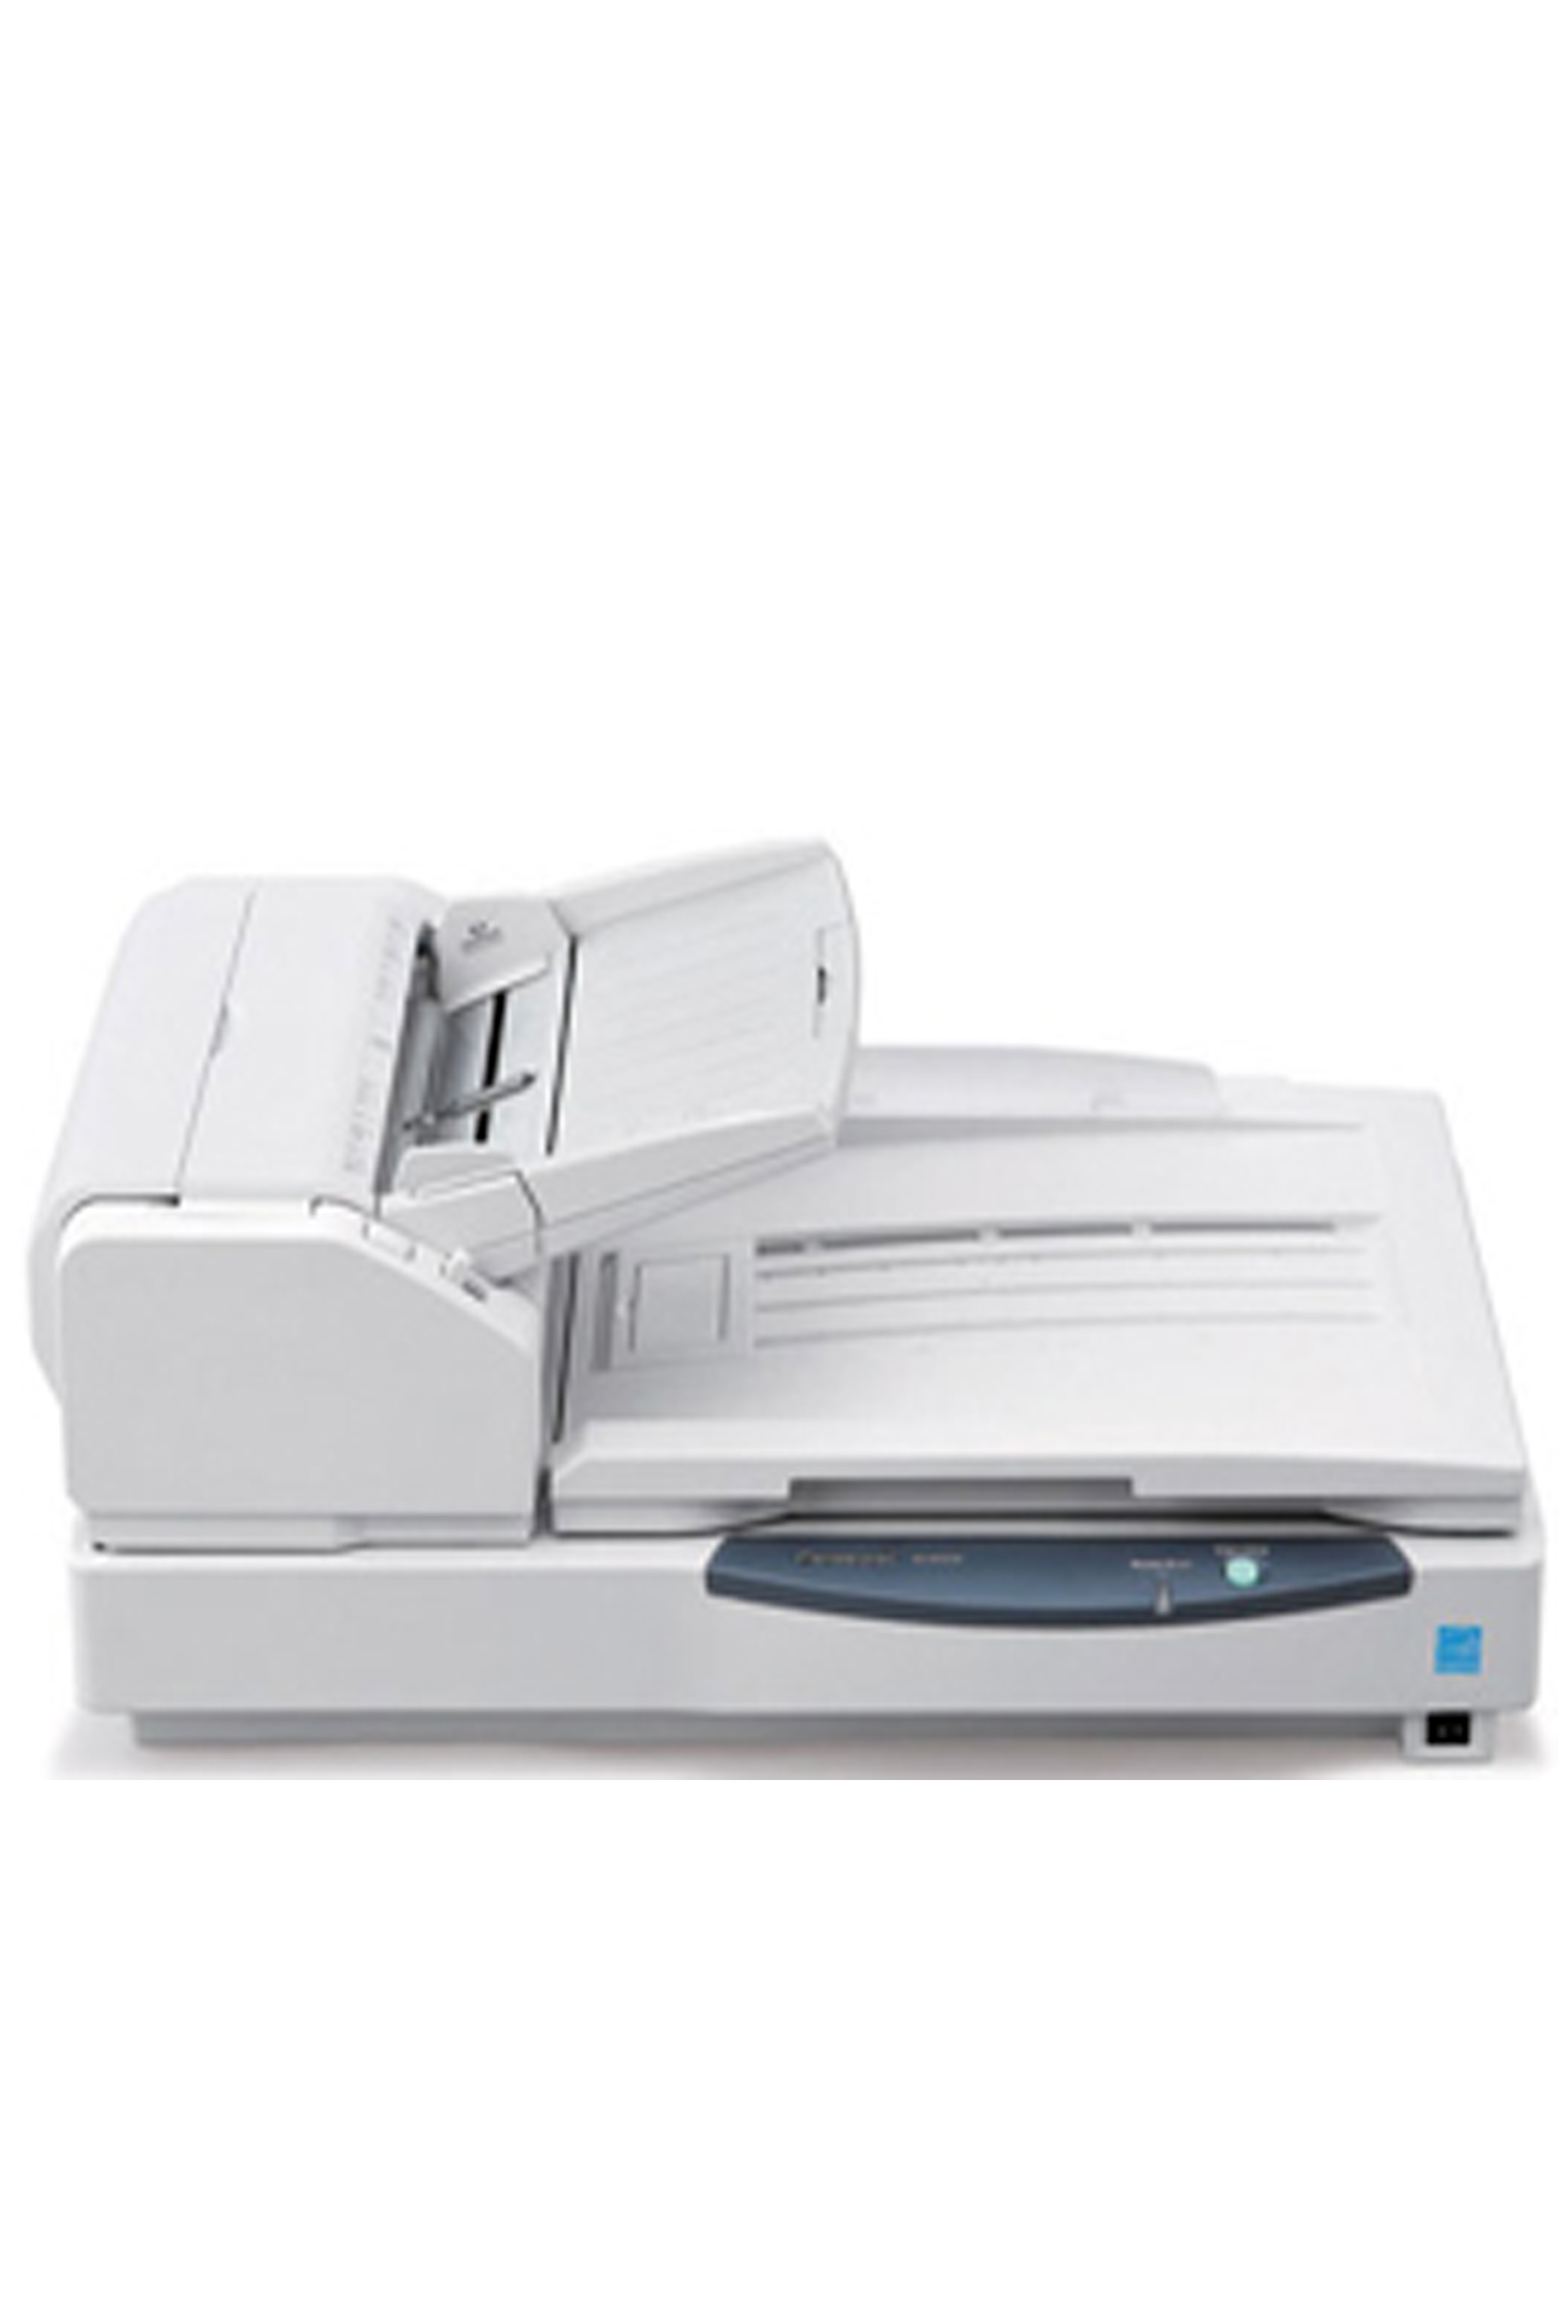 Panasonic KV-S7065C Color Duplex Flatbed Scanner (60ppm/100ipm)